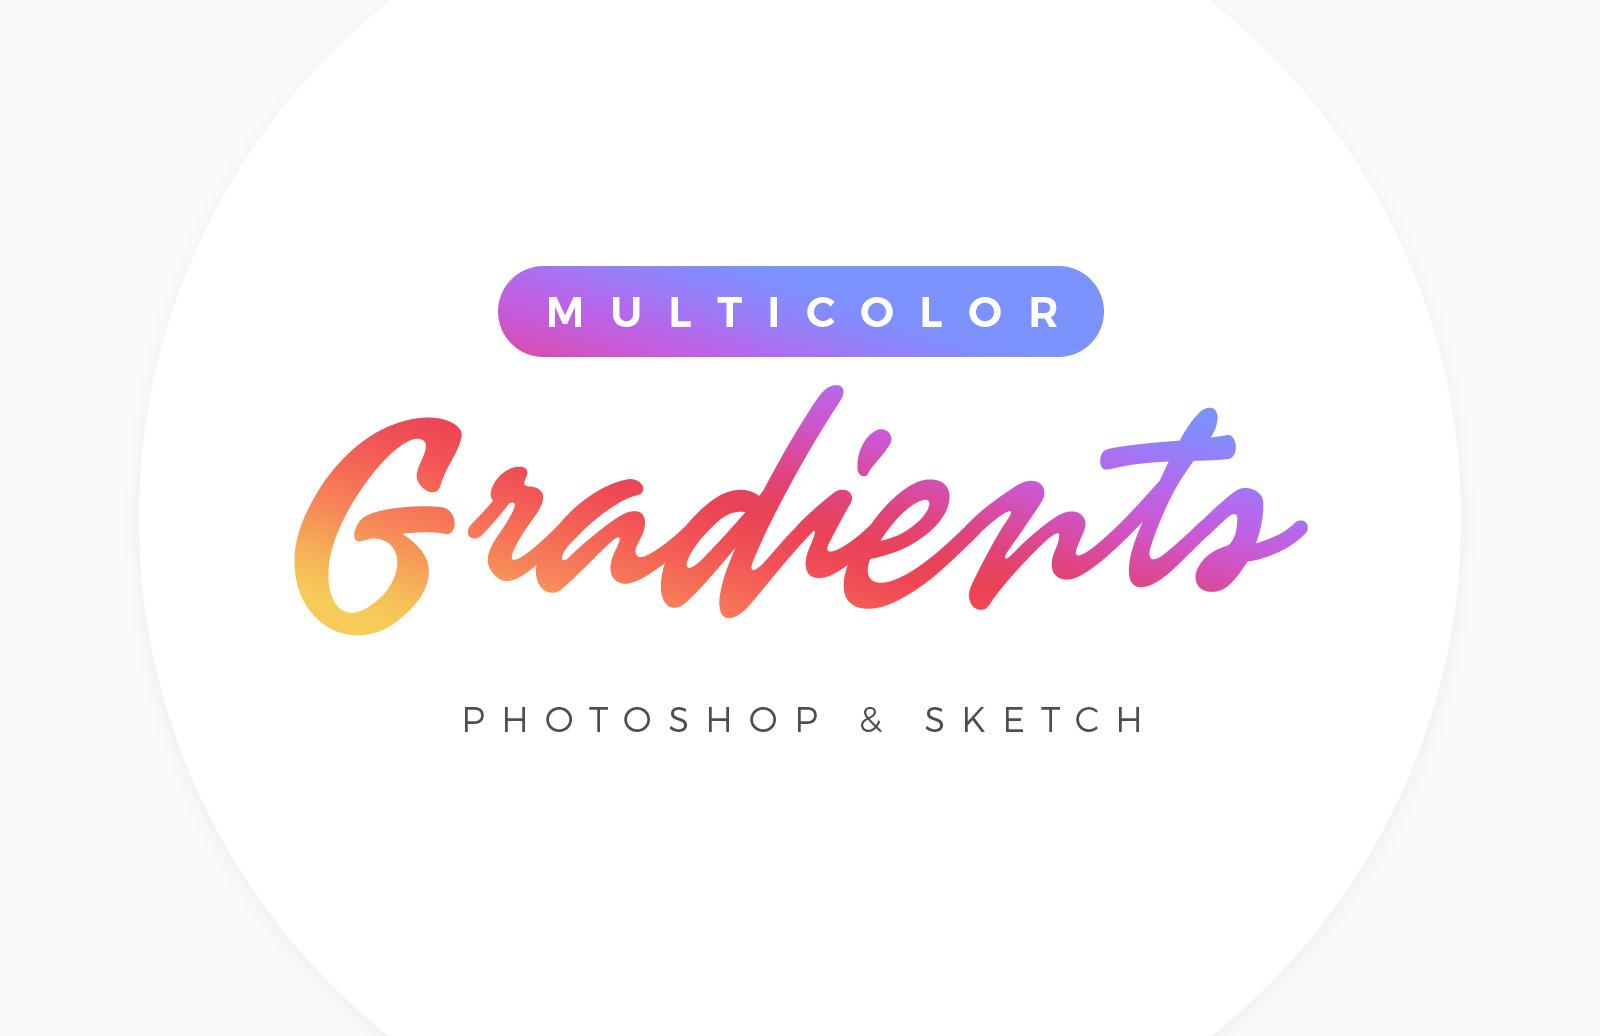 Cool Multicolor Gradients for Photoshop & Sketch